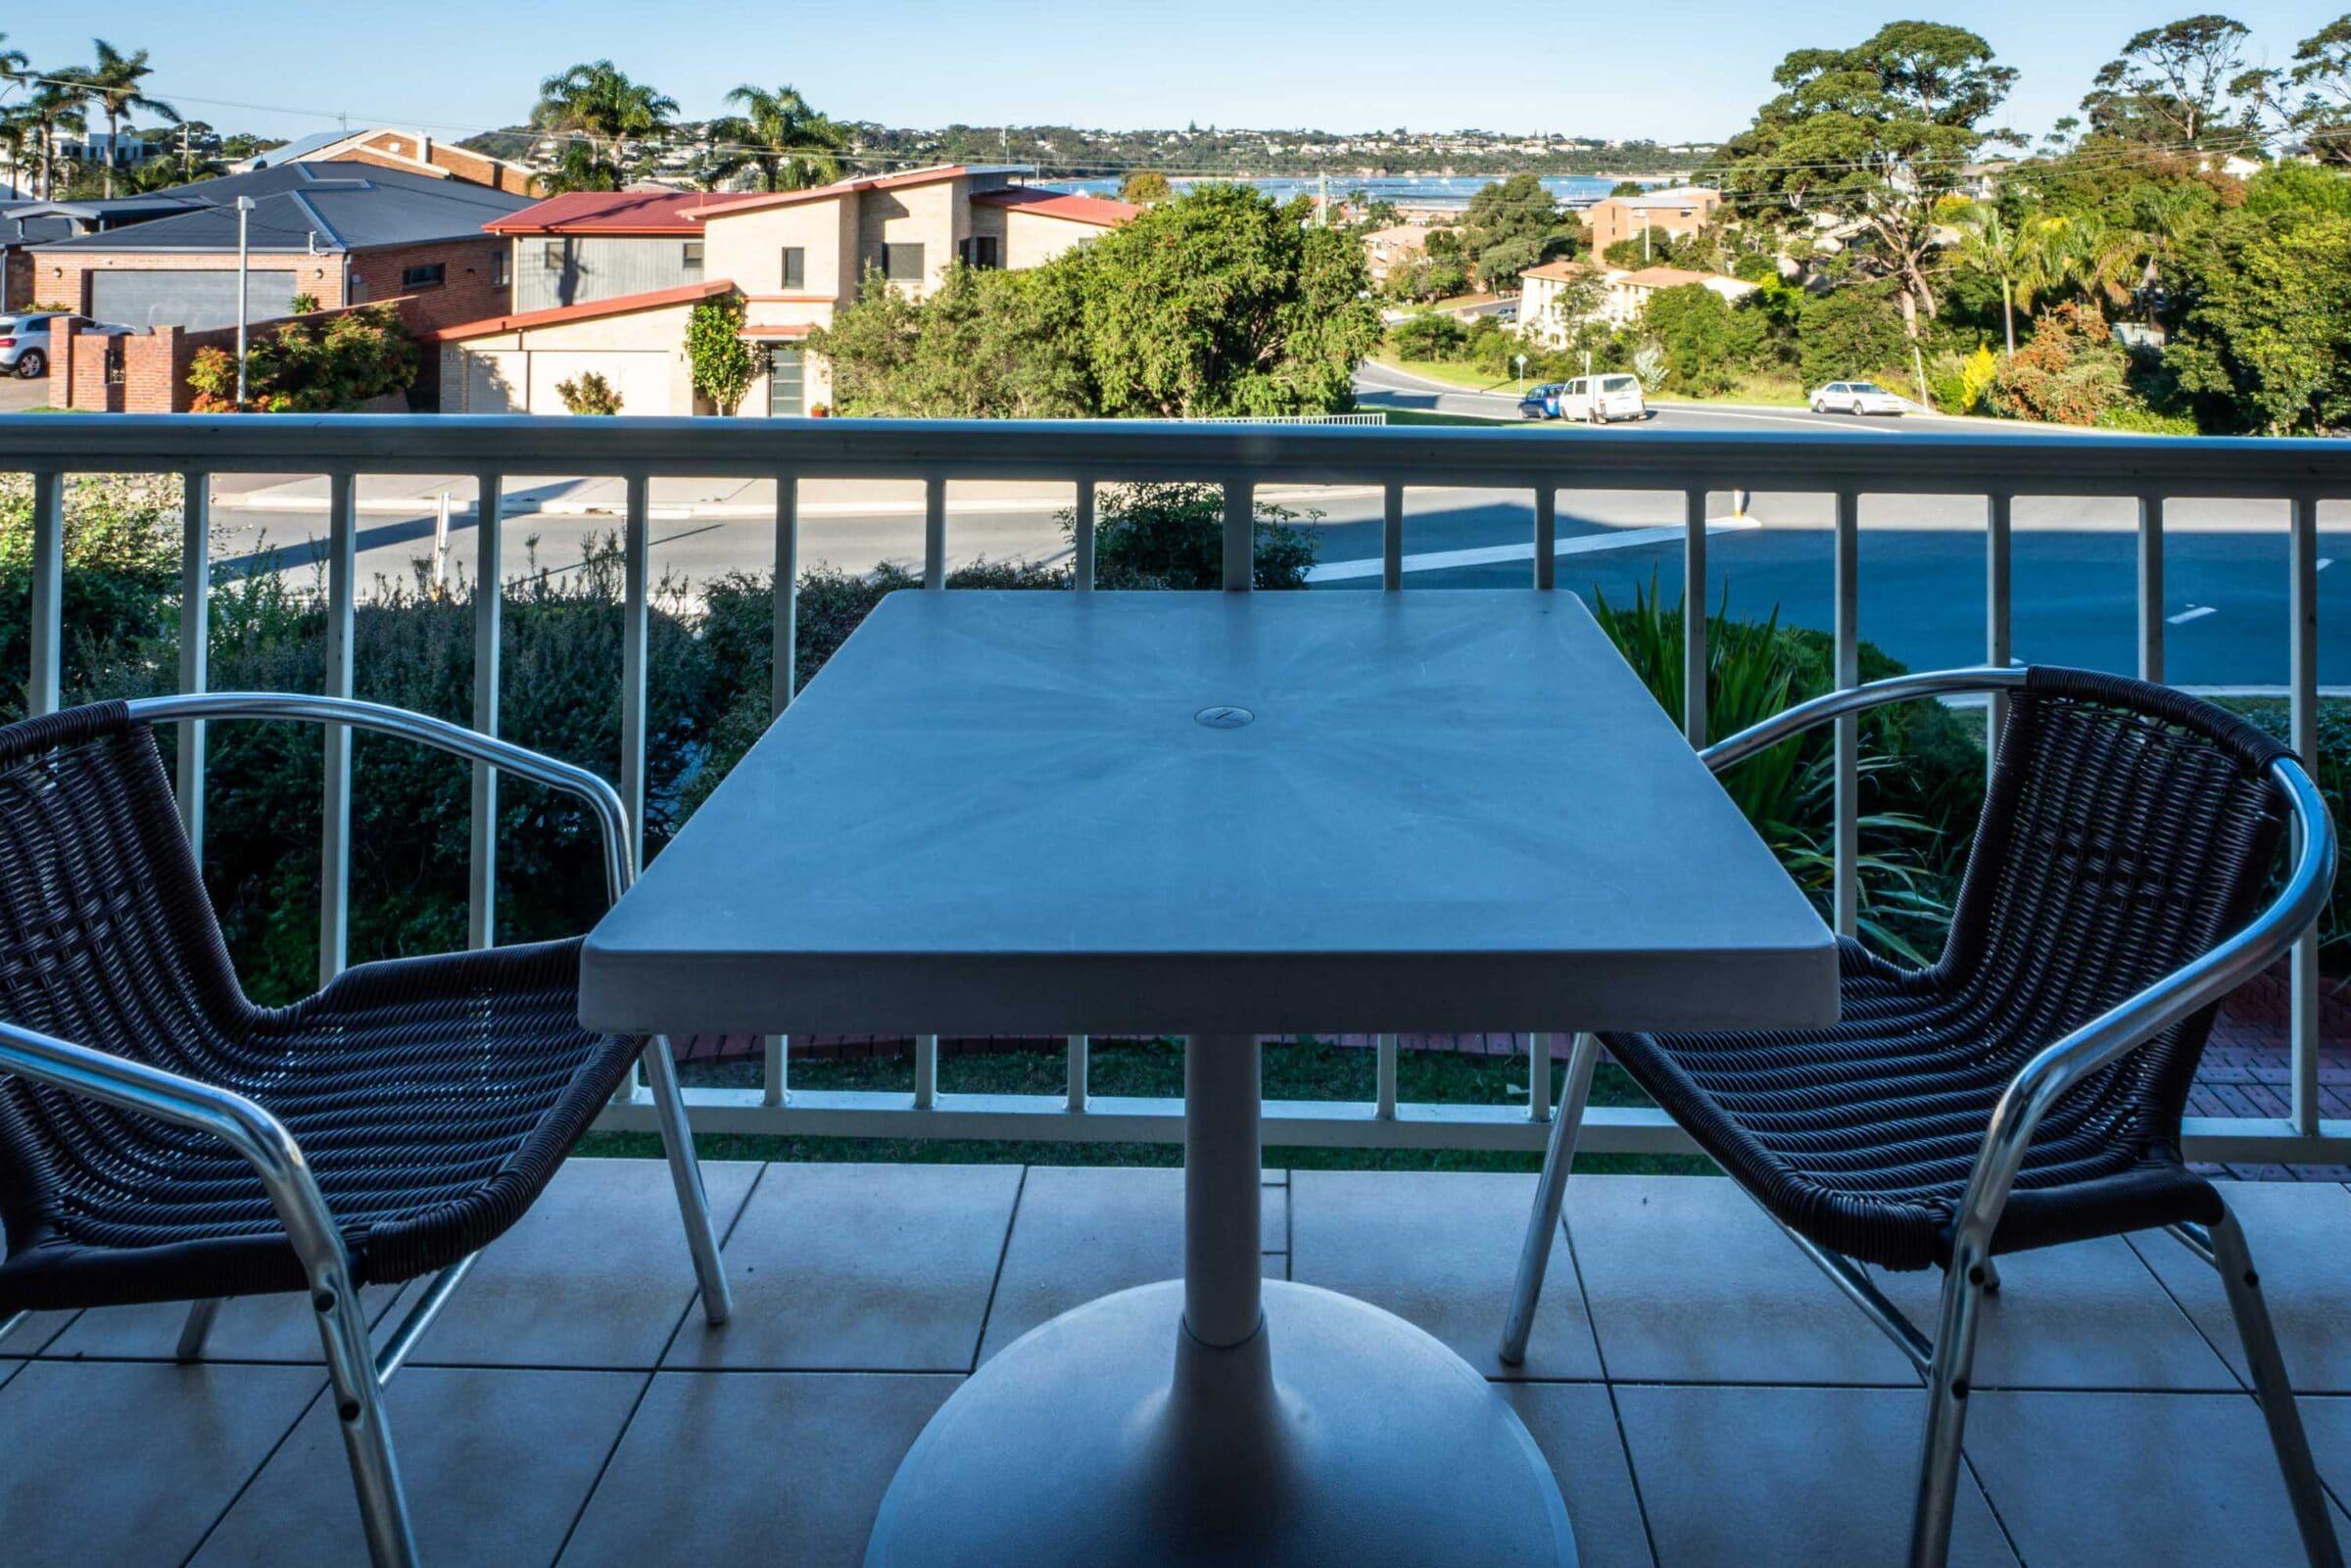 7-Outdoors Patio-7 Large Suite Merimbula Motel Accommodation - Comfort Inn Merimbula